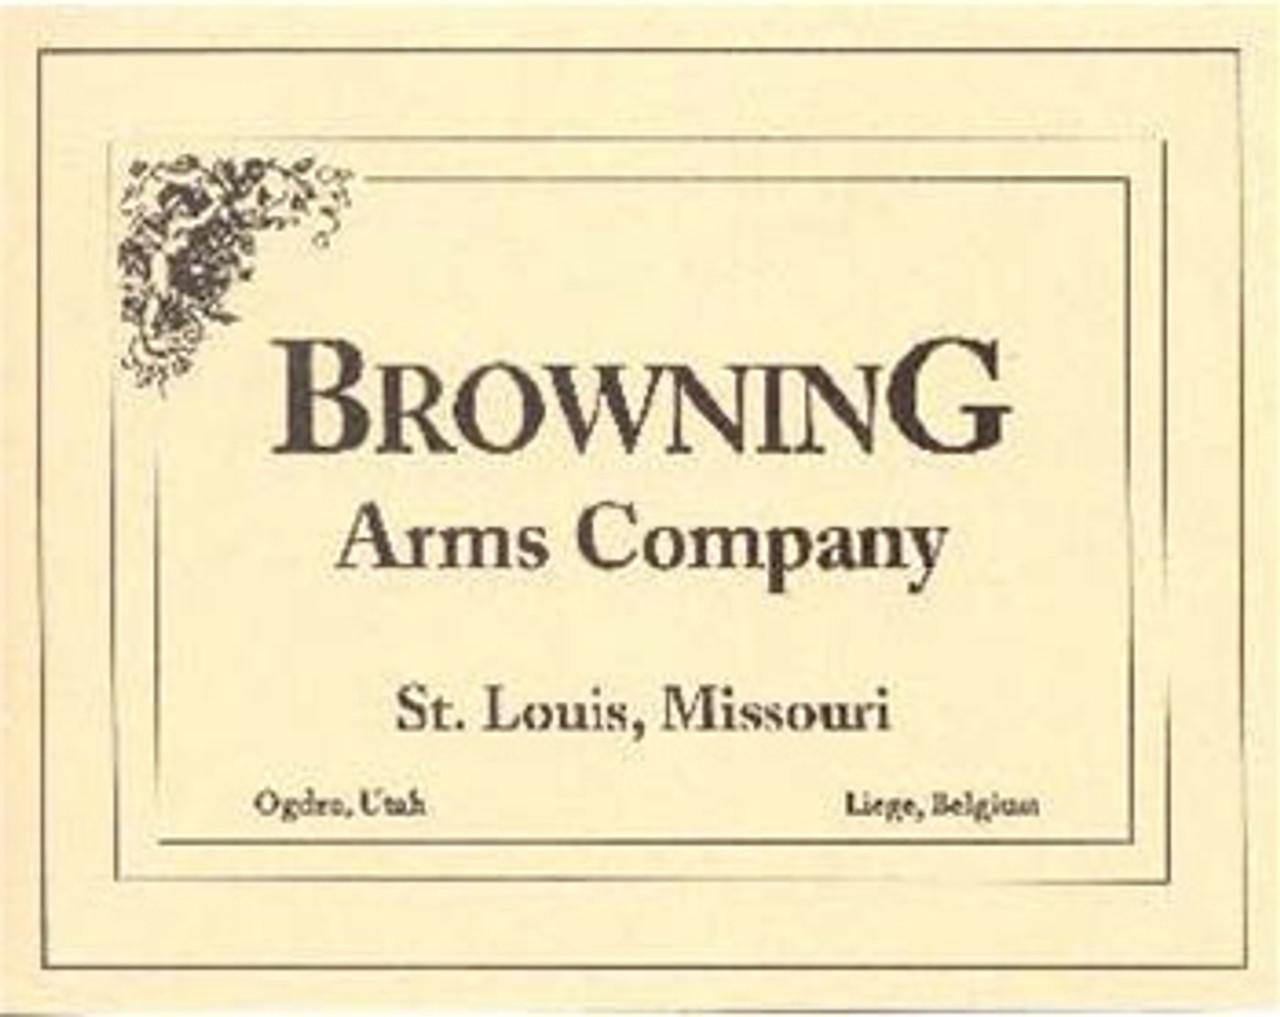 Browning Trade Label